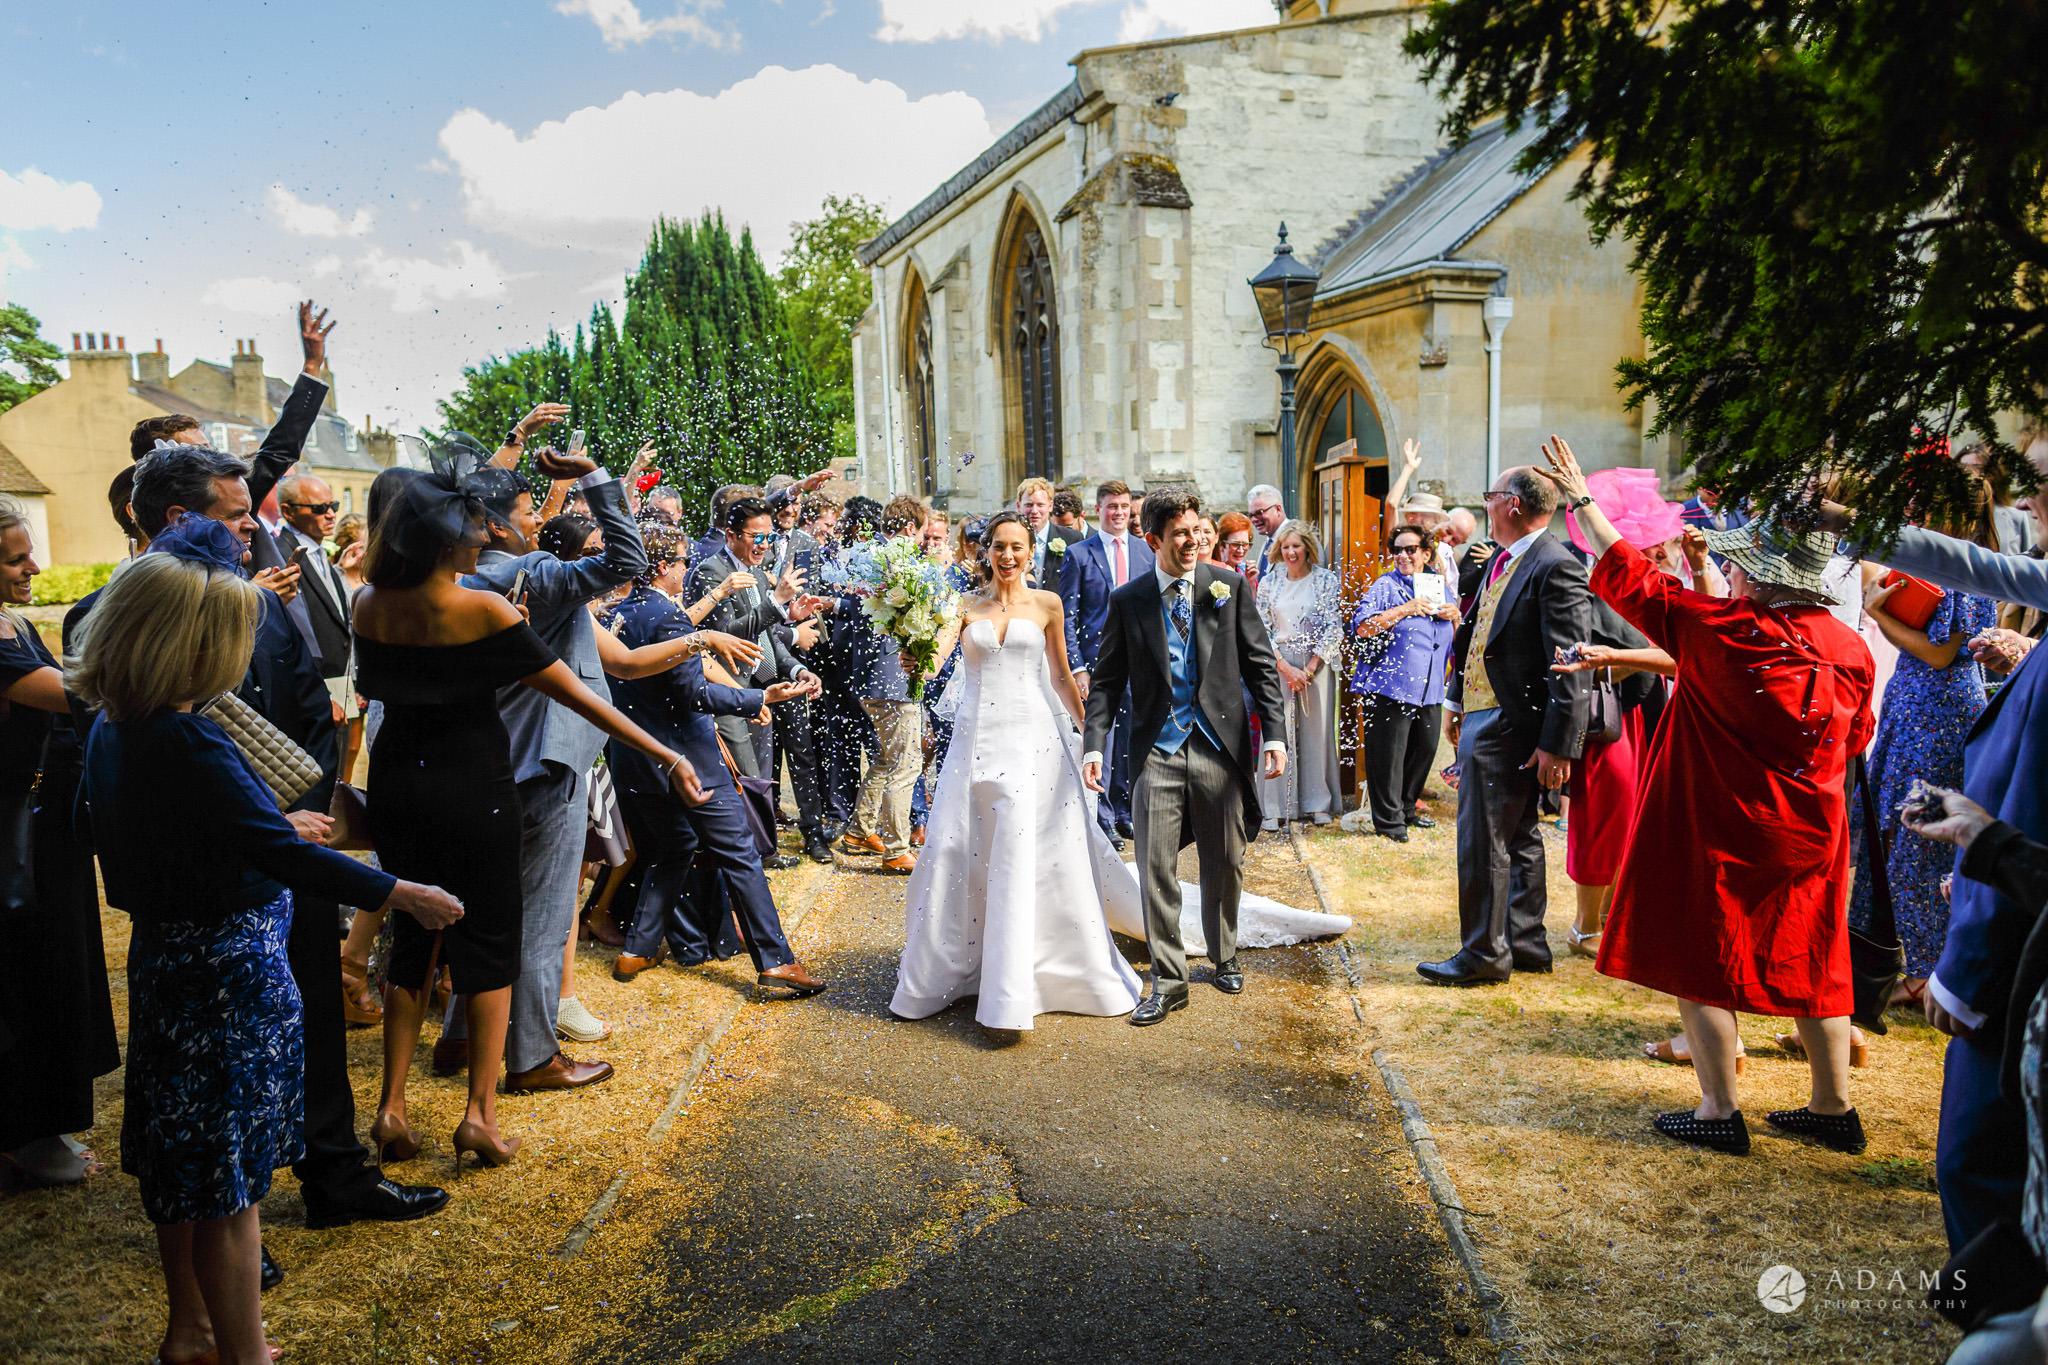 Trinity College Cambridge wedding confetti throw